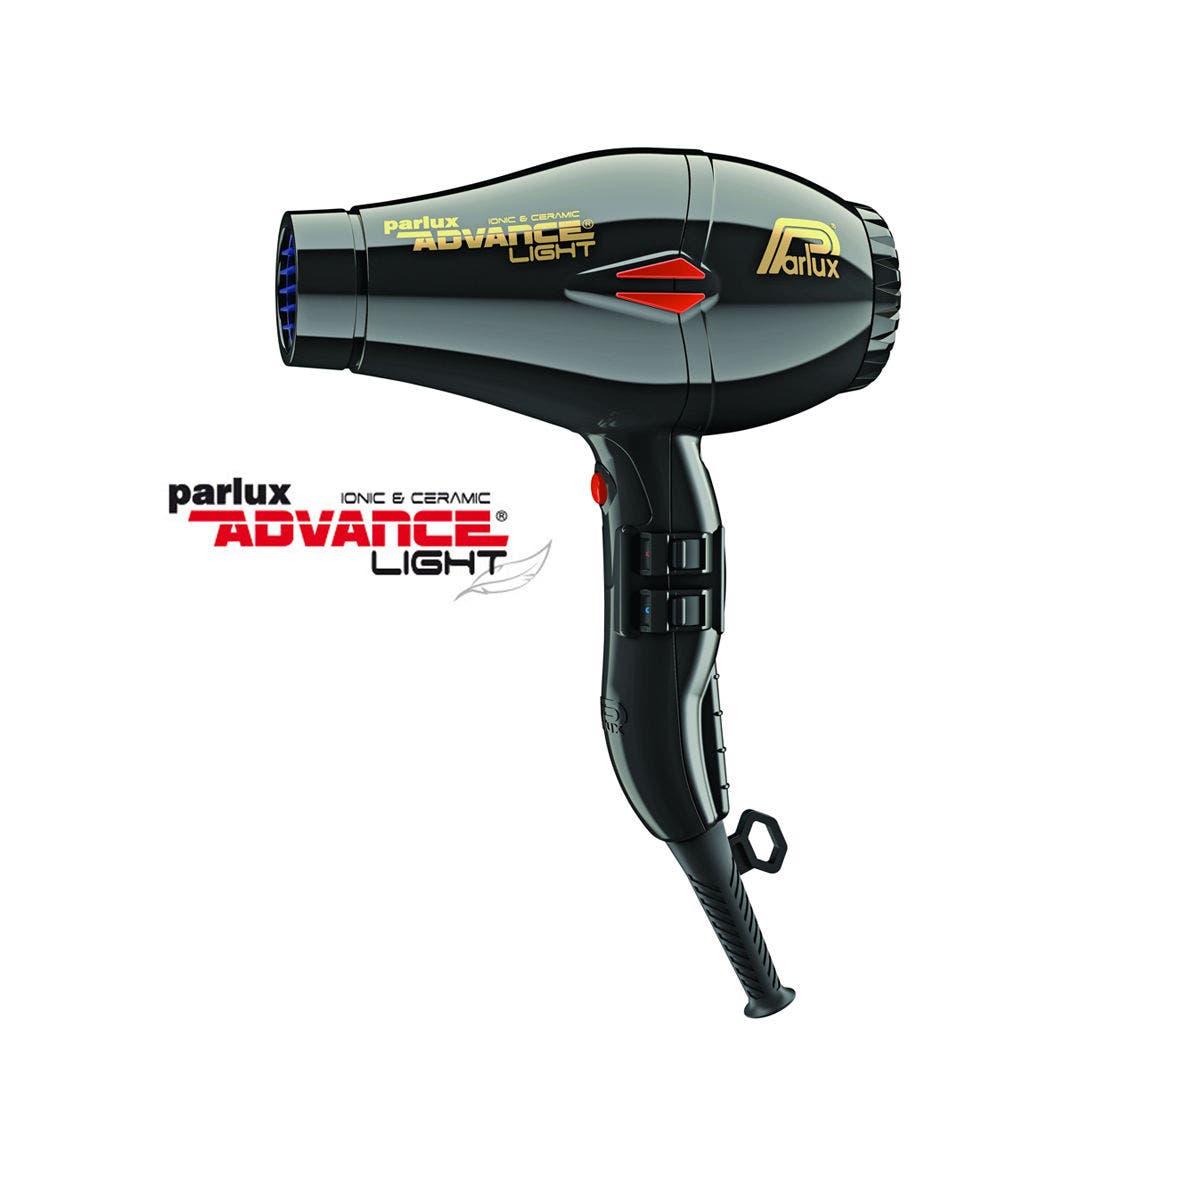 Parlux K-ADVANCE Light Hair Dryer Ionic & Ceramic - Black